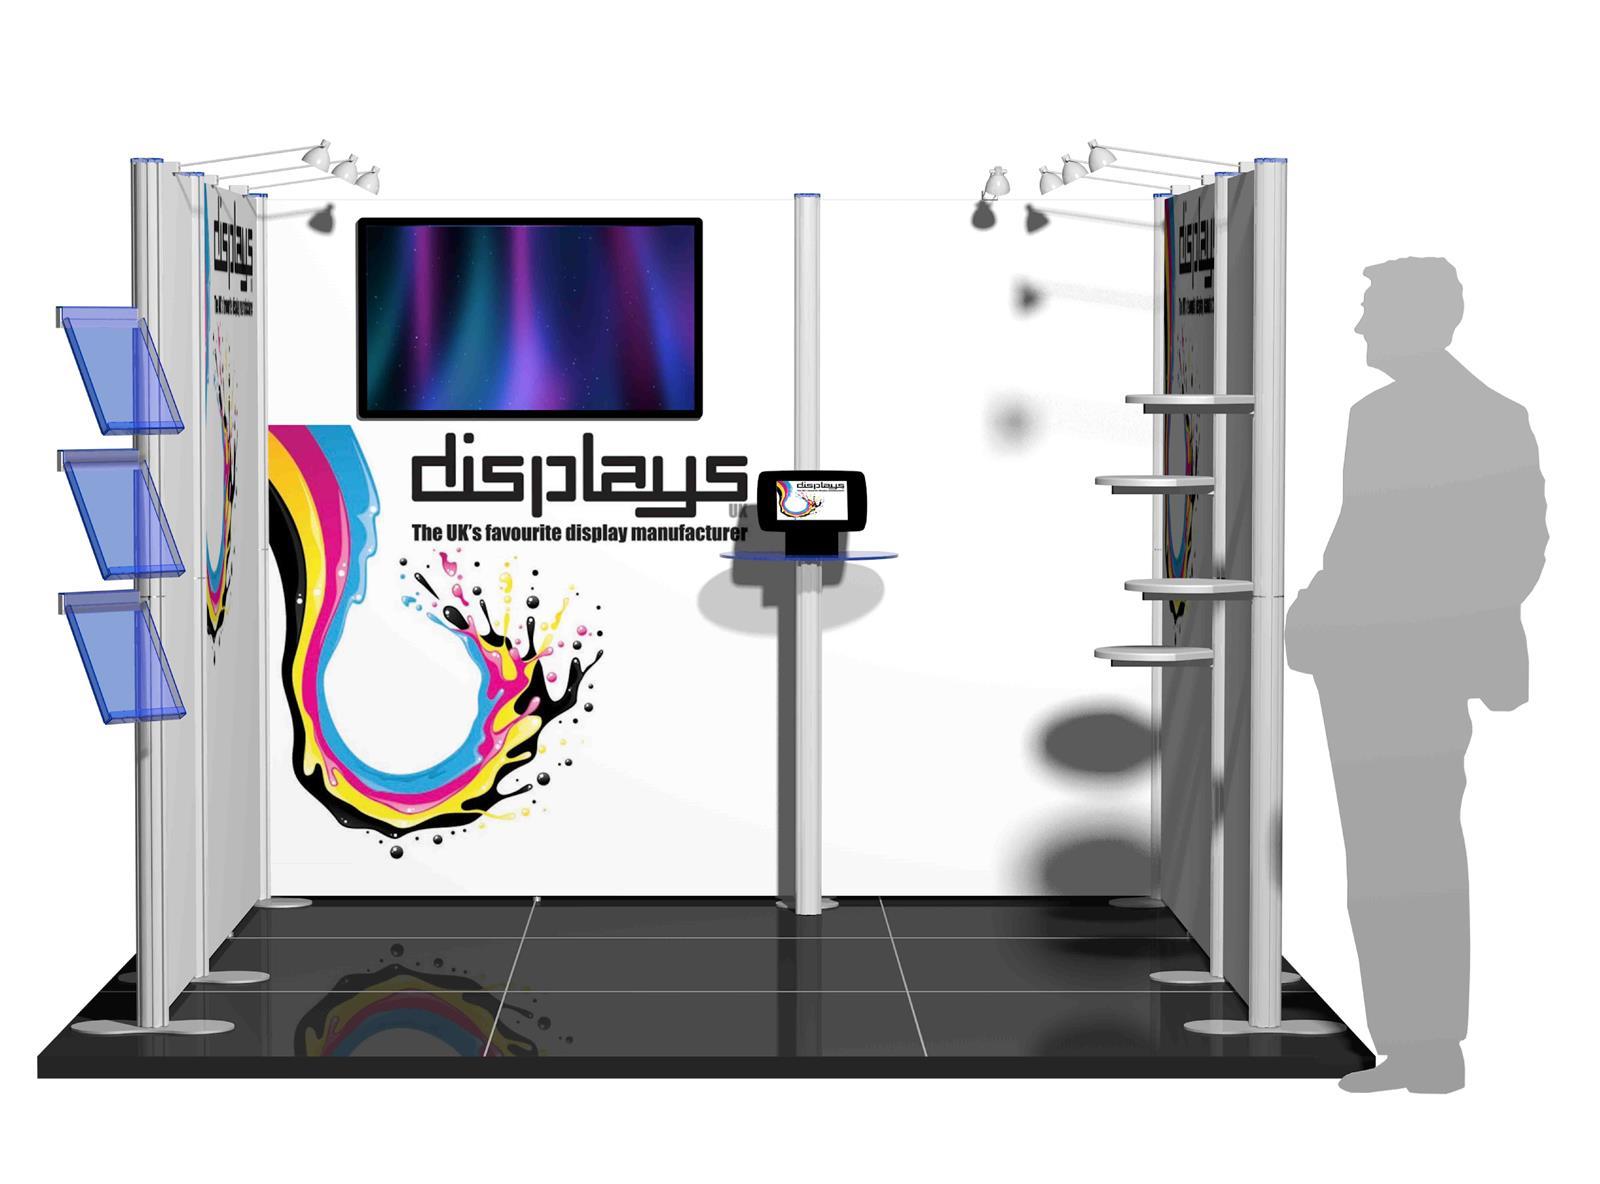 Centro 3m x 3m Modular Exhibition Stand - C3x3-1a